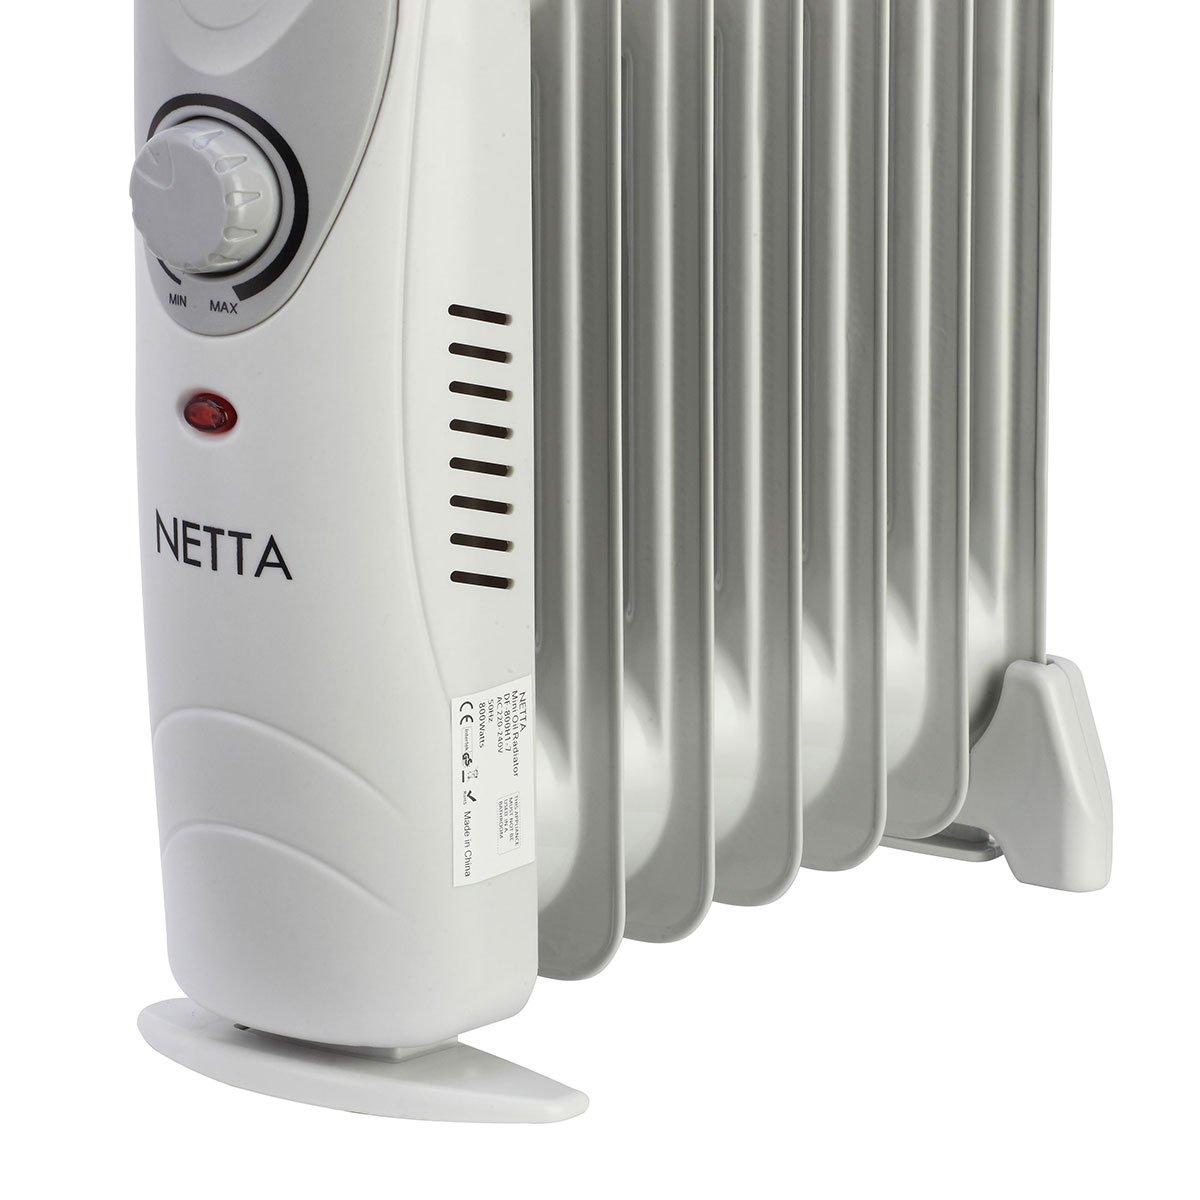 NETTA Radiador con baño de Aceite eléctrica con termostato, 800W: Amazon.es: Hogar